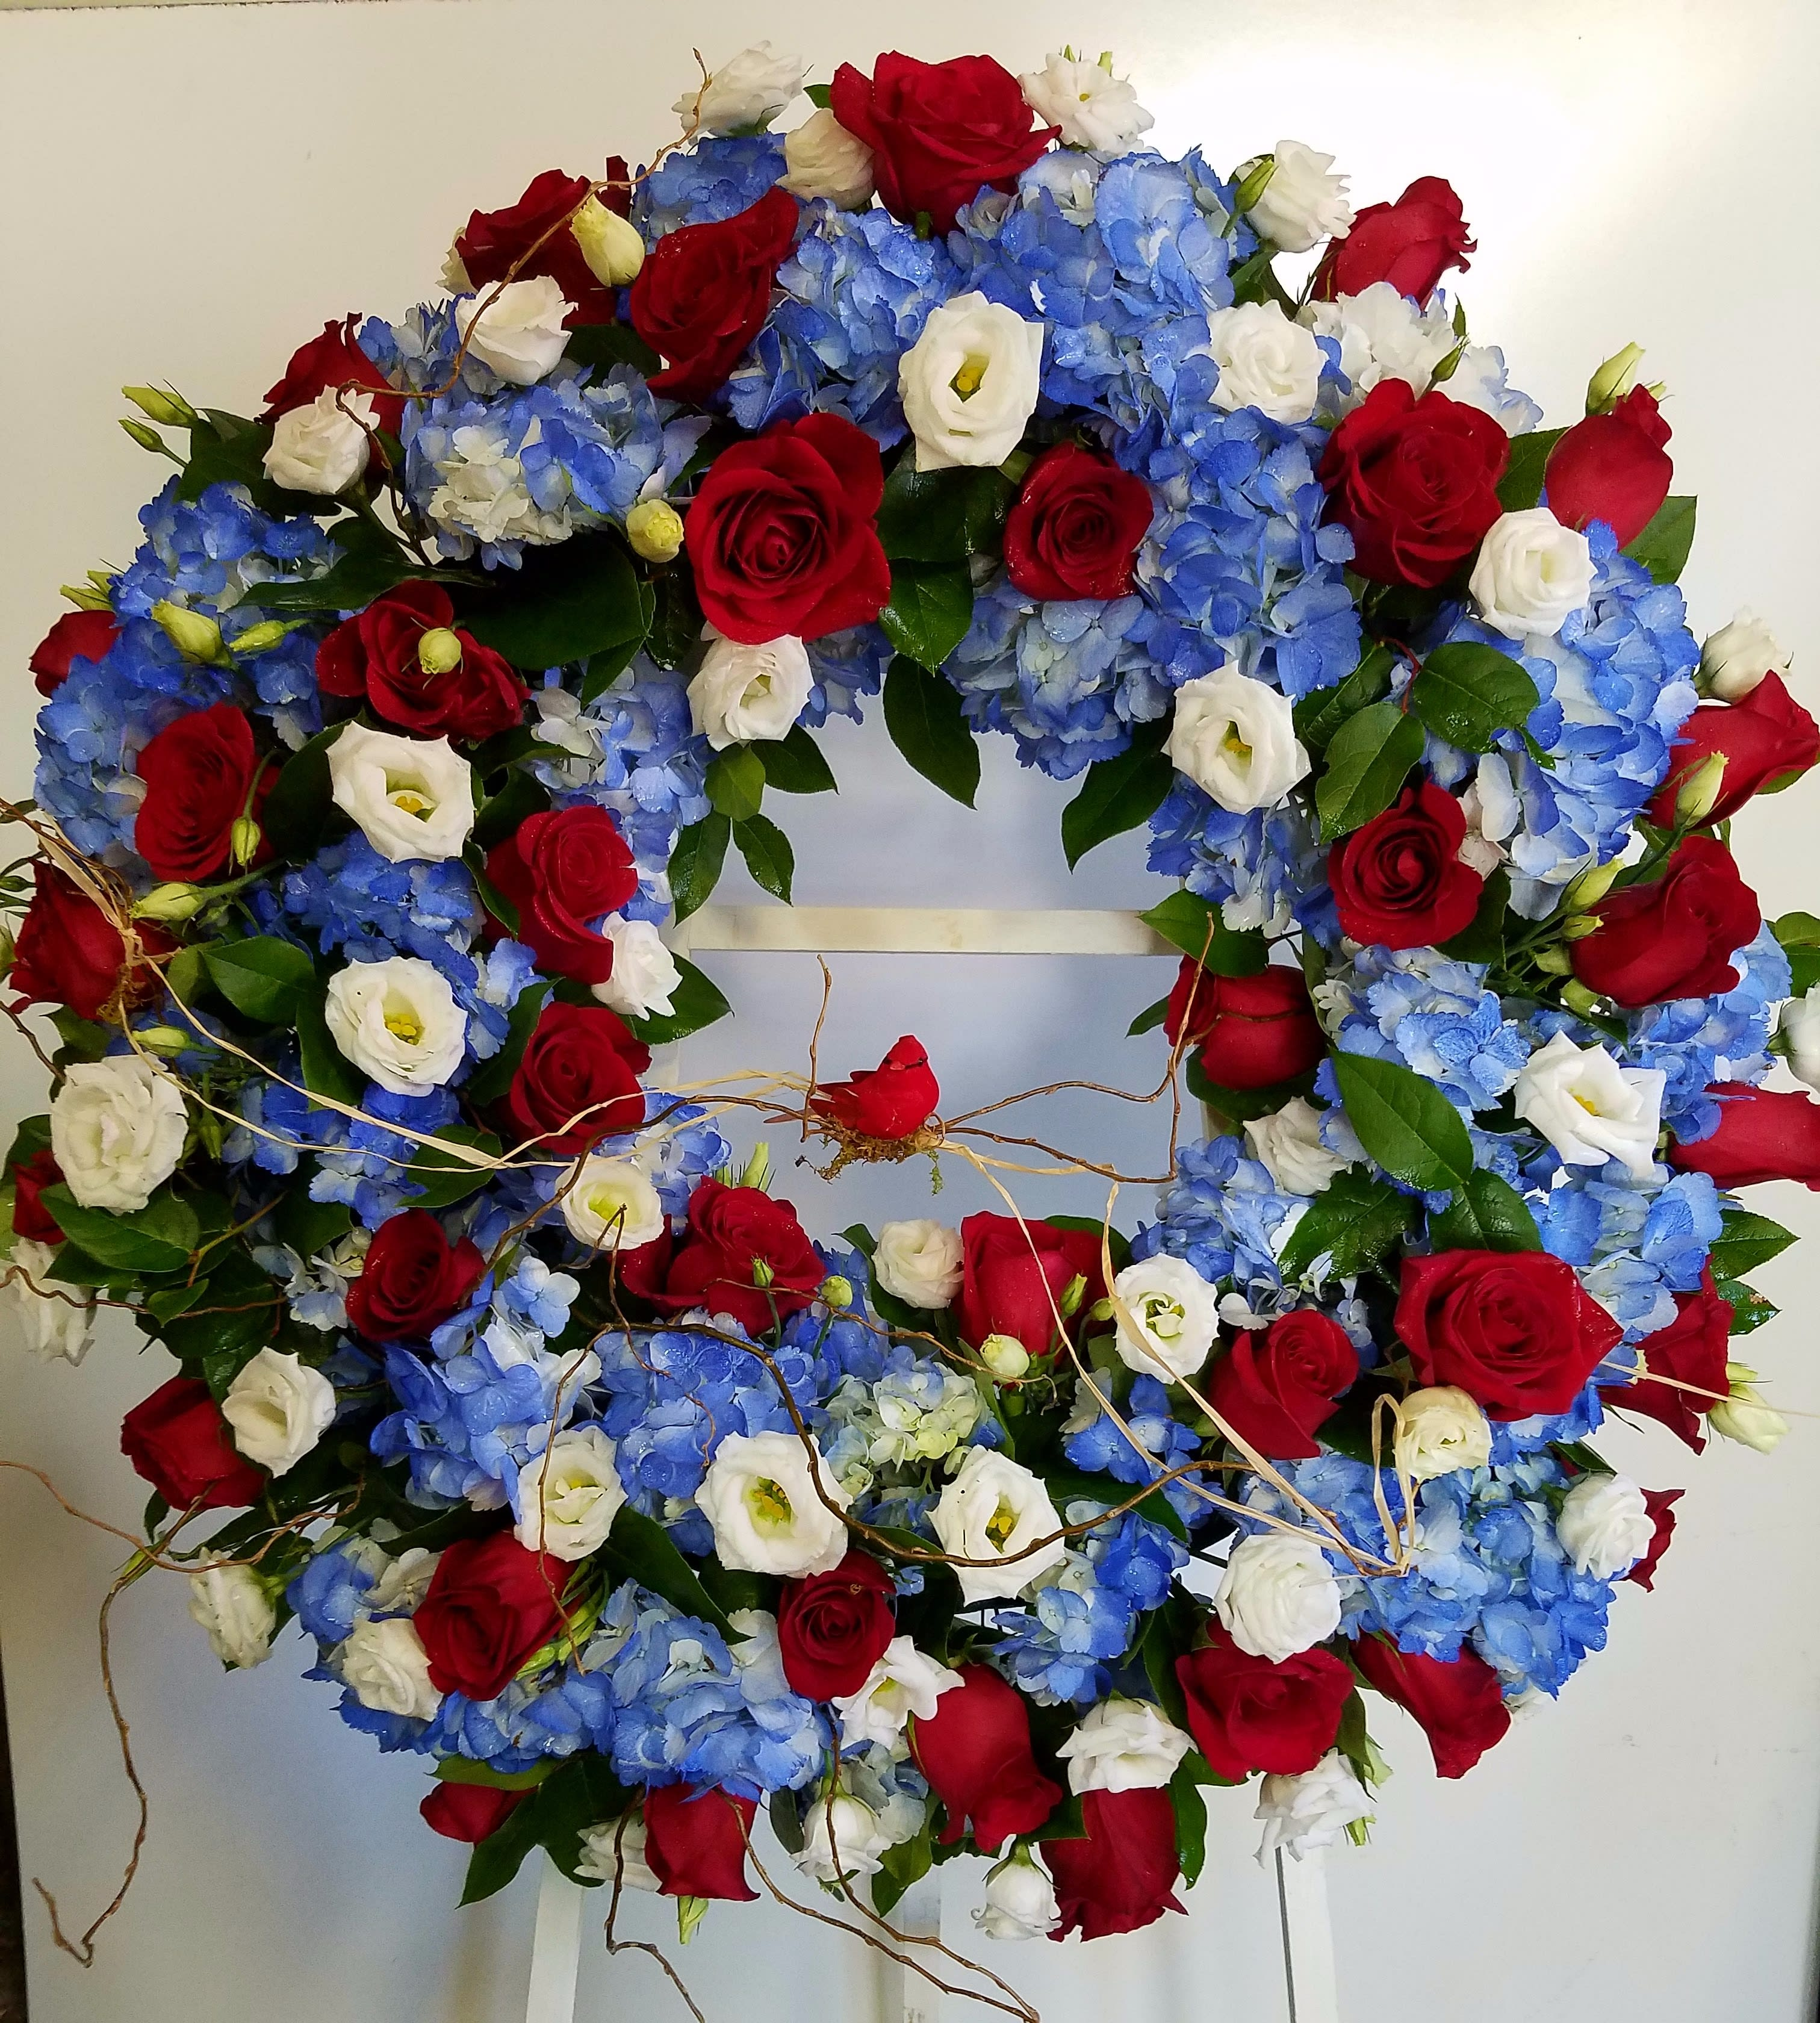 Eckert Florist's Patriotic Floral Wreath